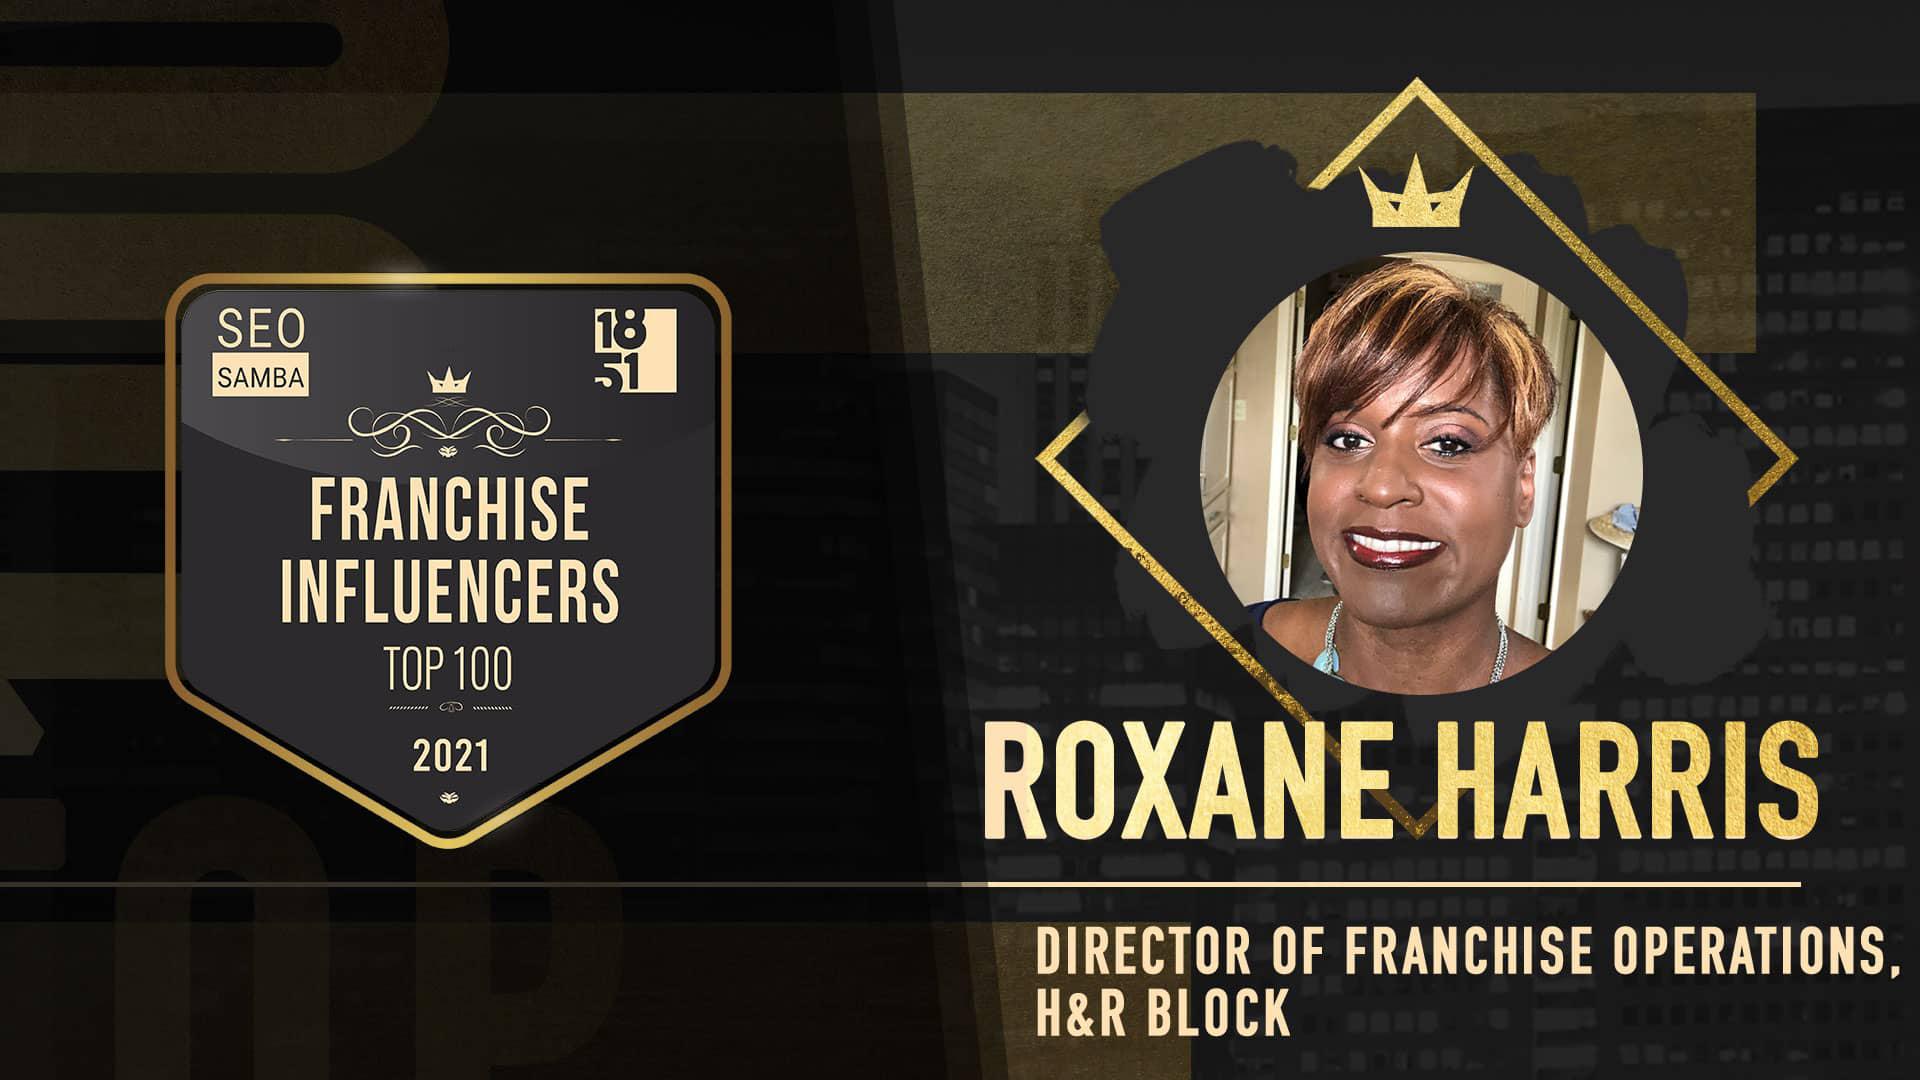 roxane-harris-h-and-r-block